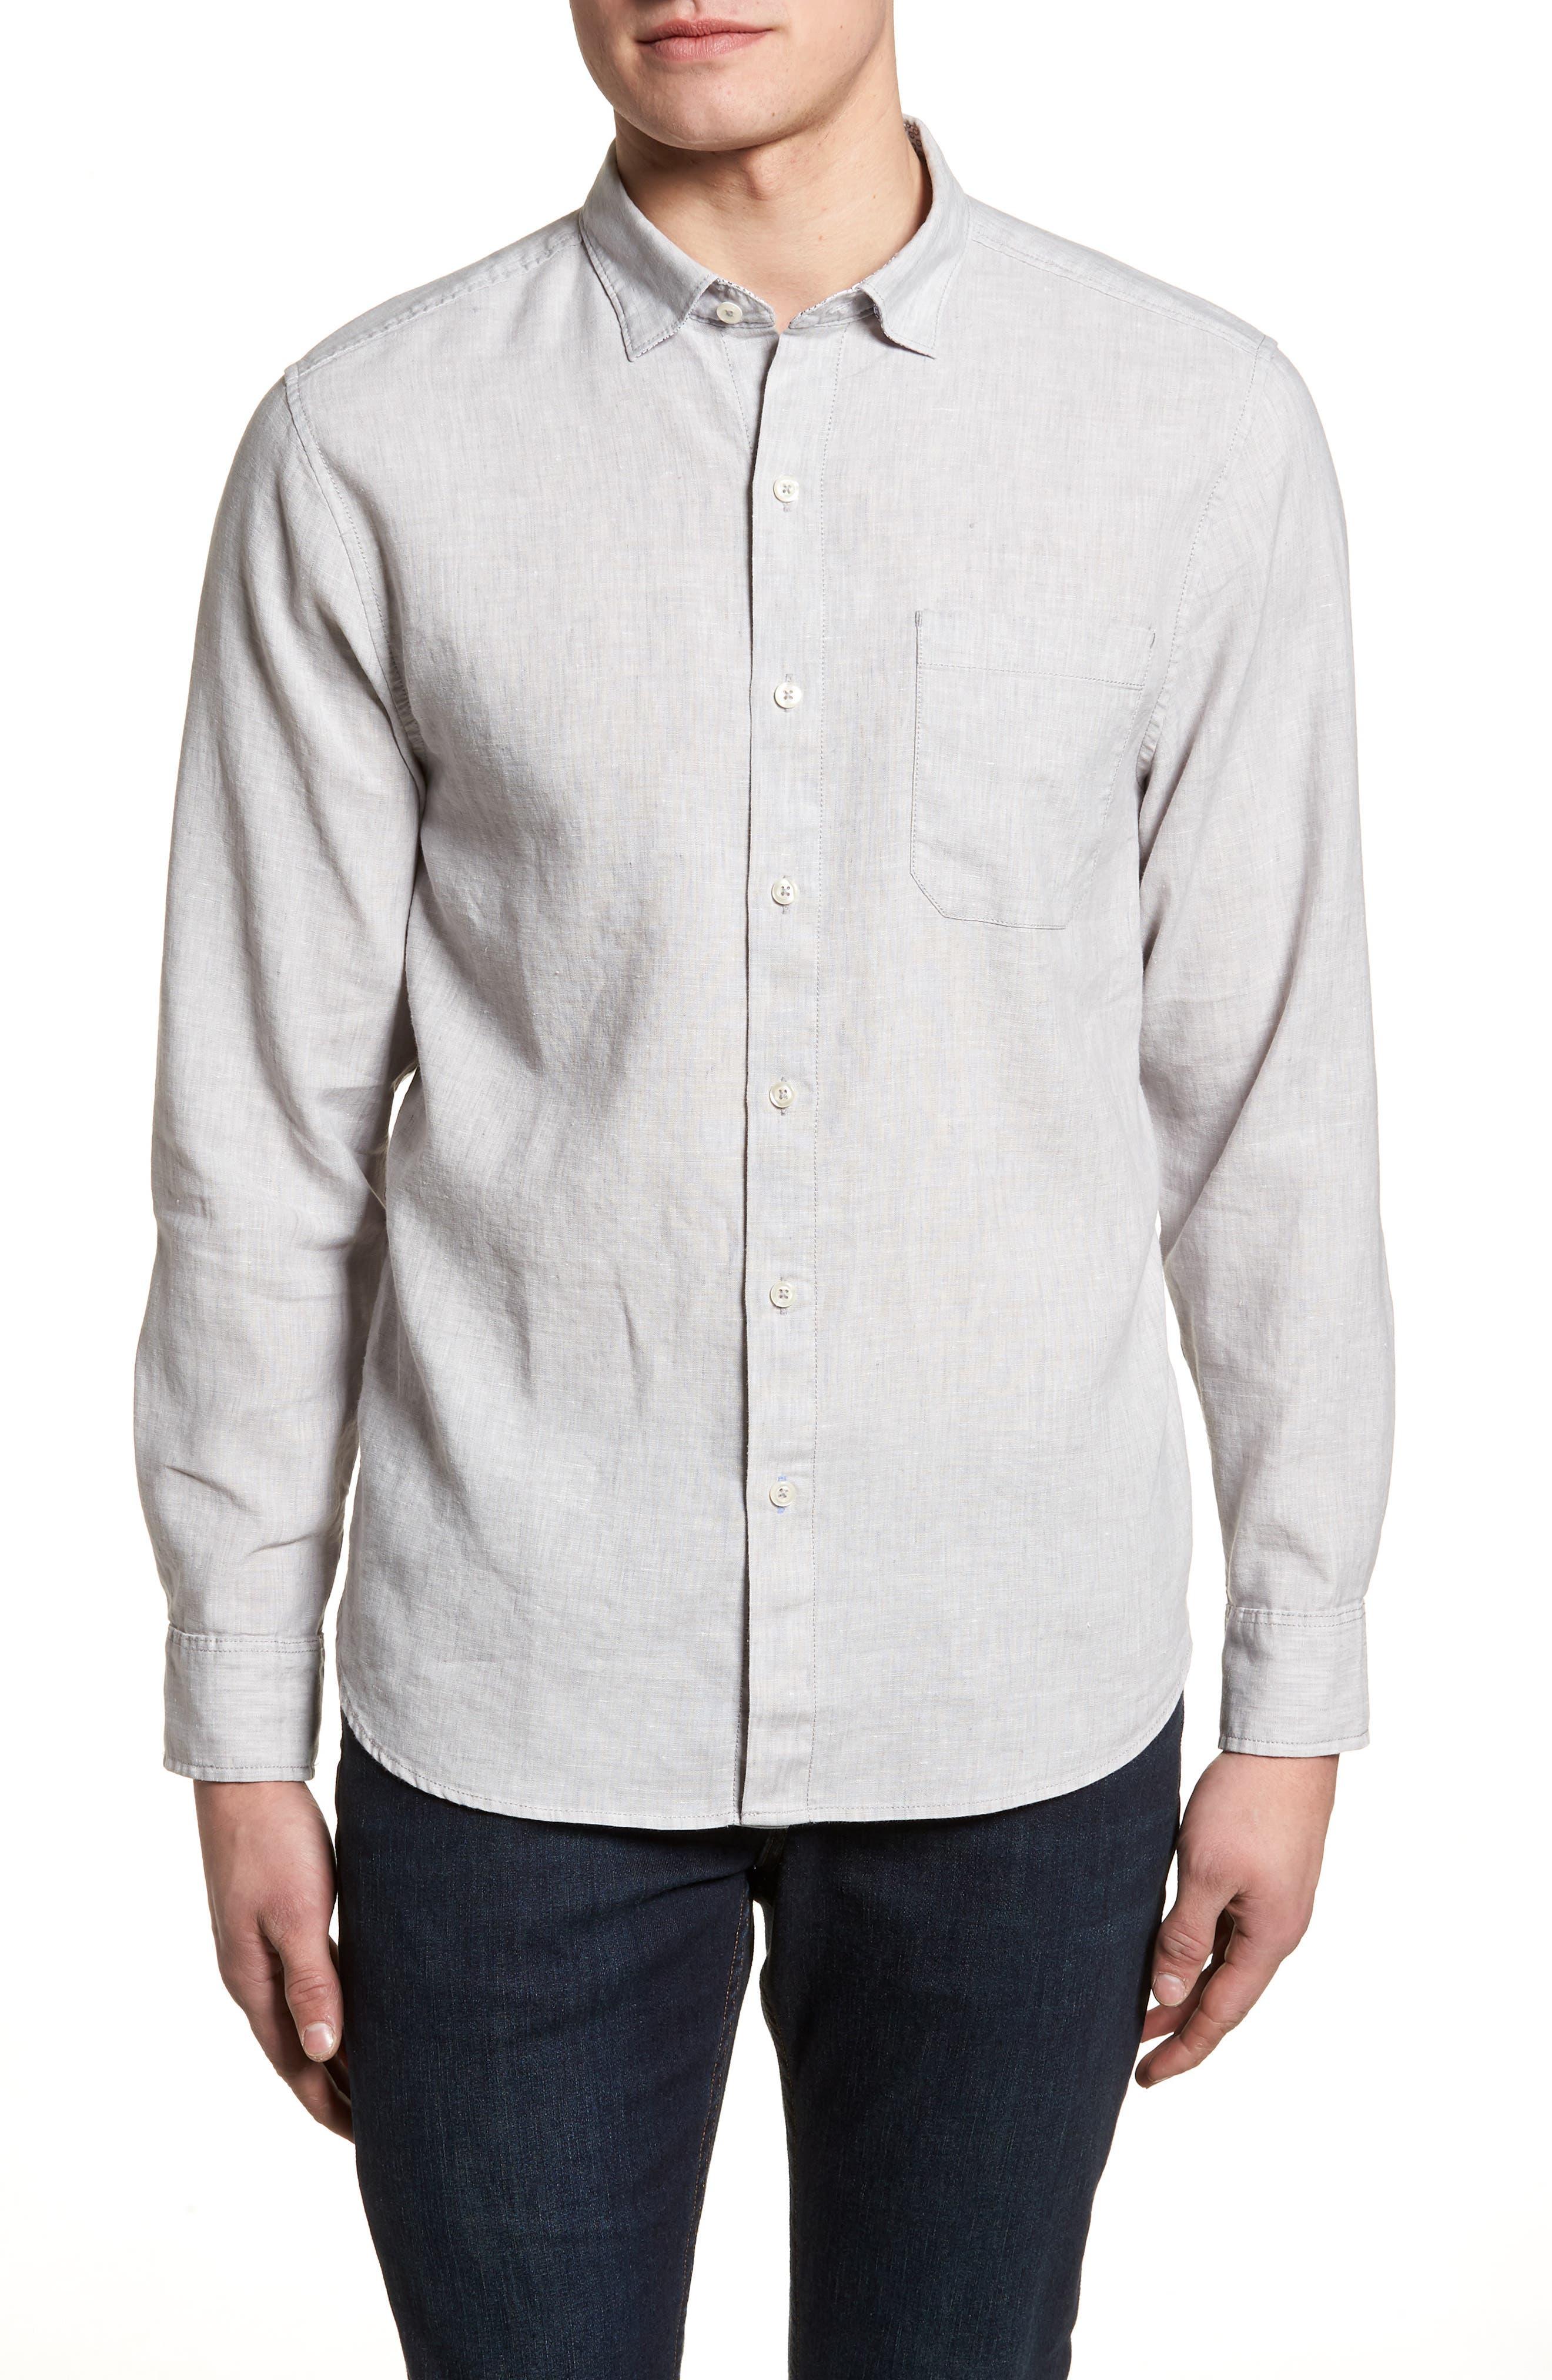 Lanai Tides Linen Blend Sport Shirt,                             Main thumbnail 1, color,                             020